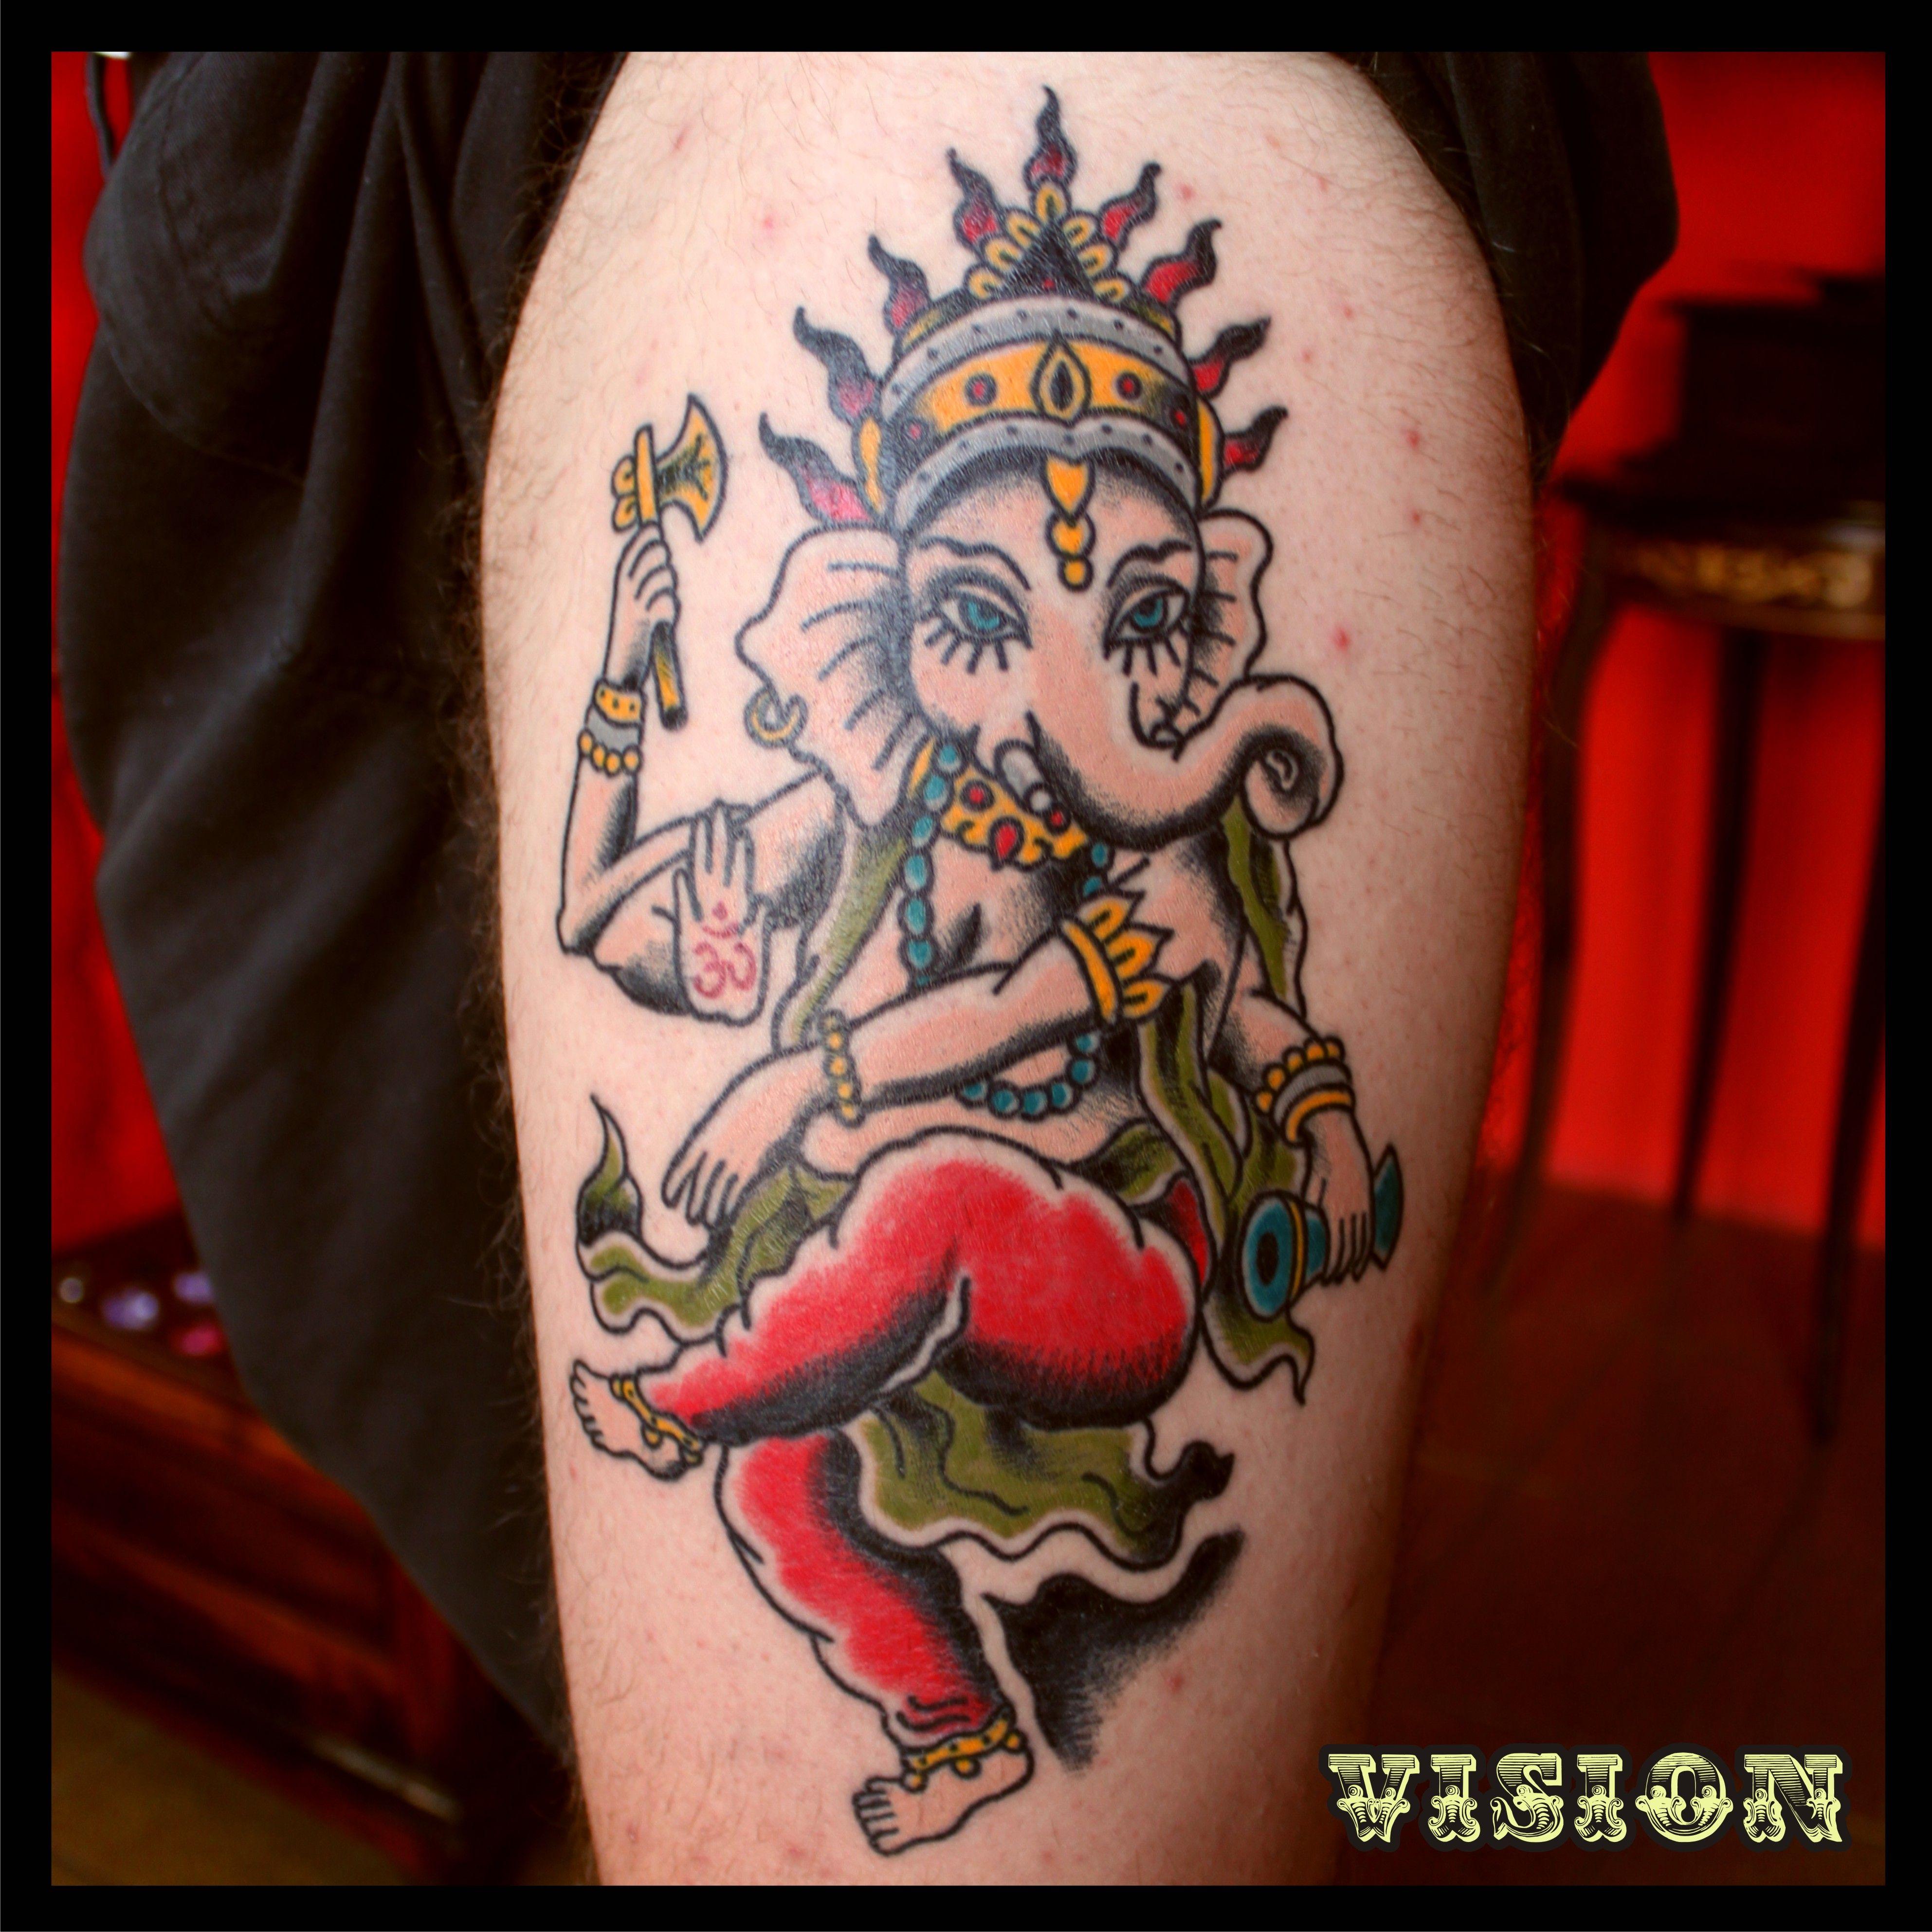 11 ganesha tattoo designs ideas and samples - Ganesha Tattoo Old School Traditional By Vision Renato